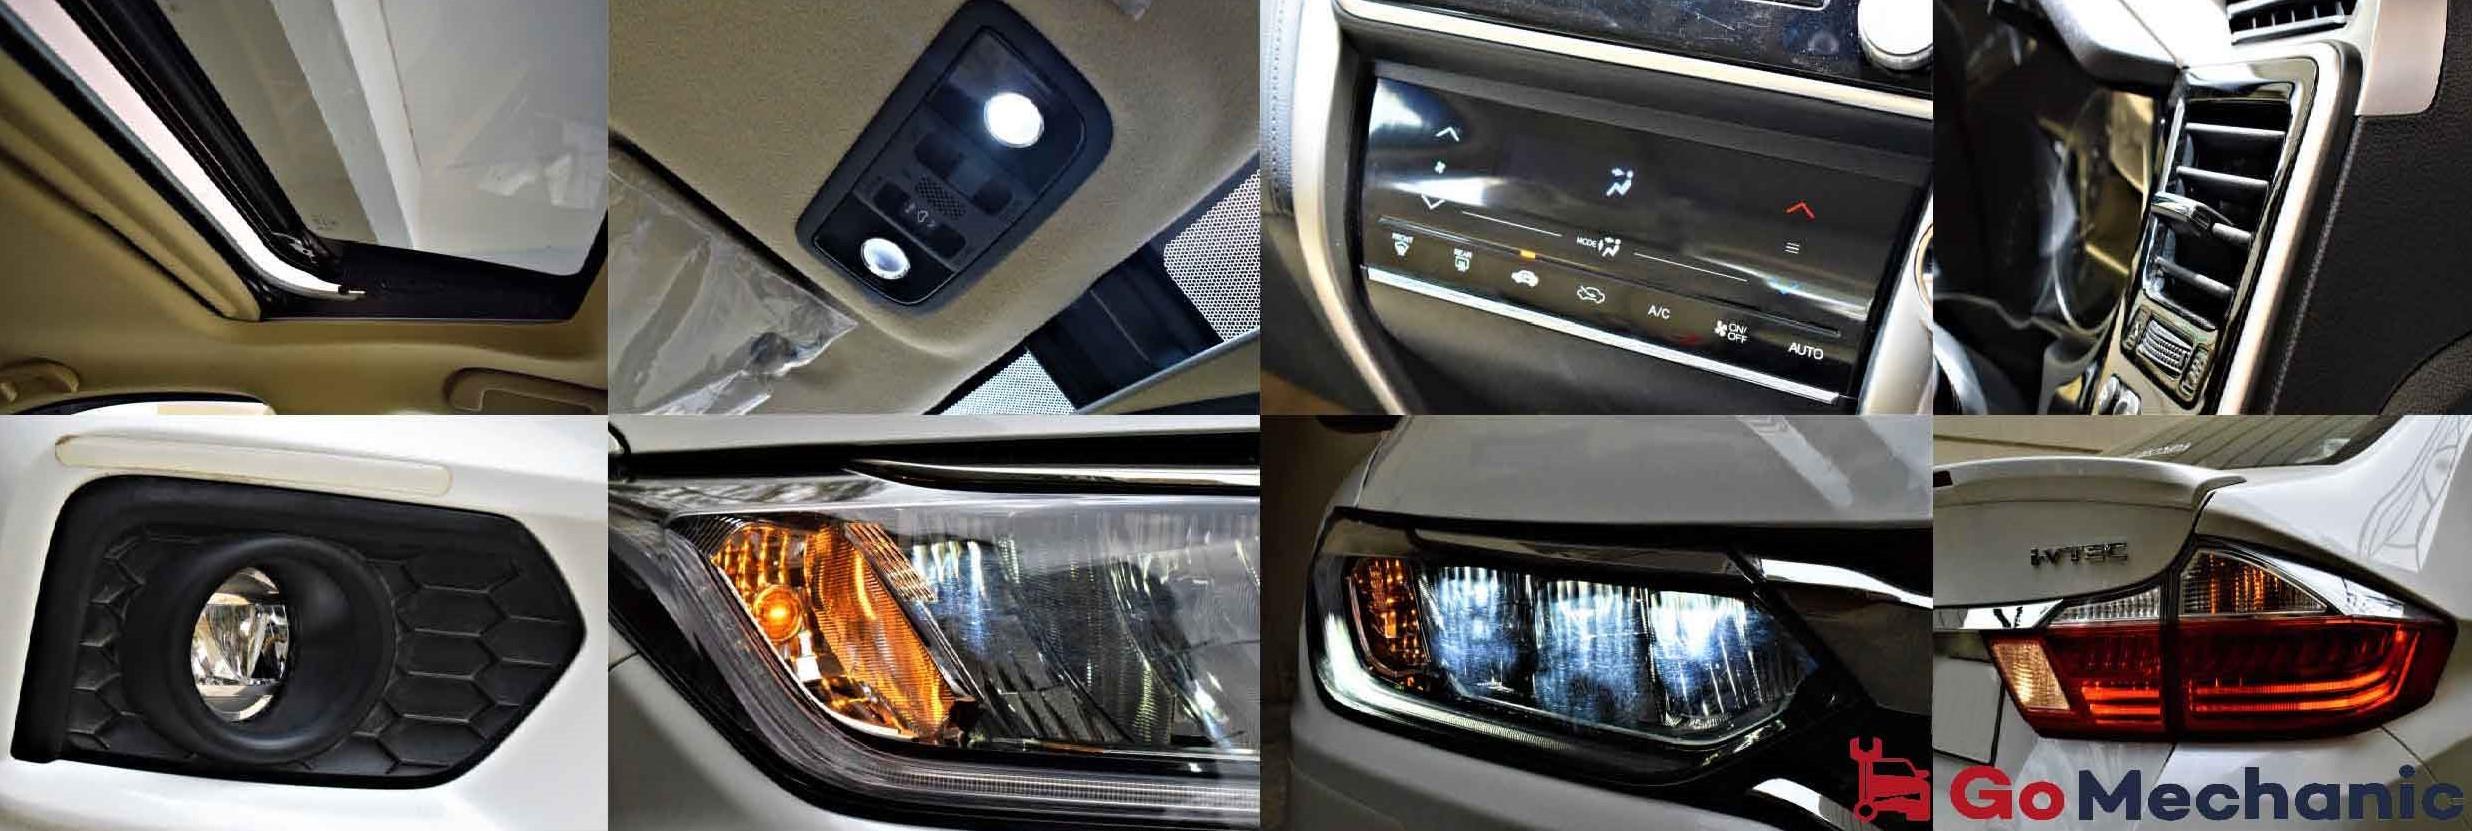 2017 Honda City Sunroof, LED Headlamps, AC check for Preventive Maintenance